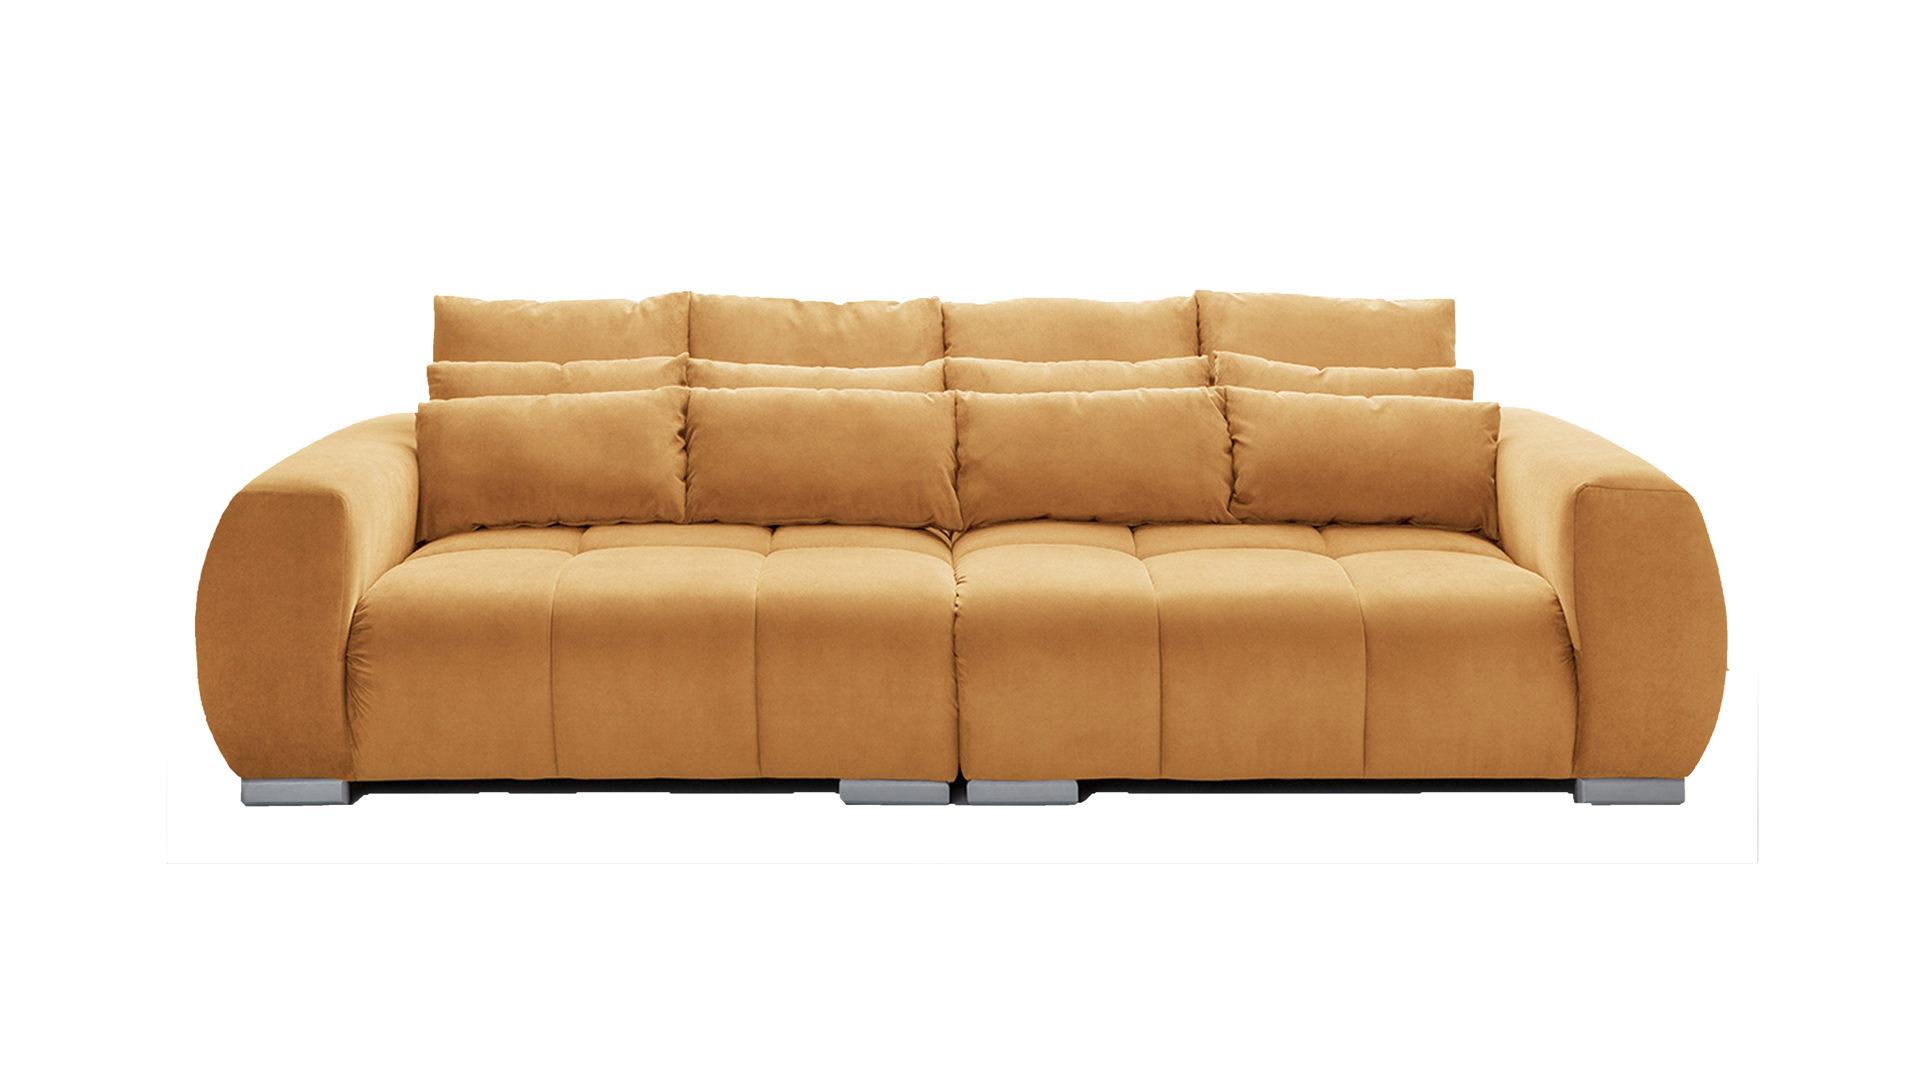 Möbel Hermes , Markenshops, Wohnzimmer, KAWOO, KAWOO Bigsofa Escape ...